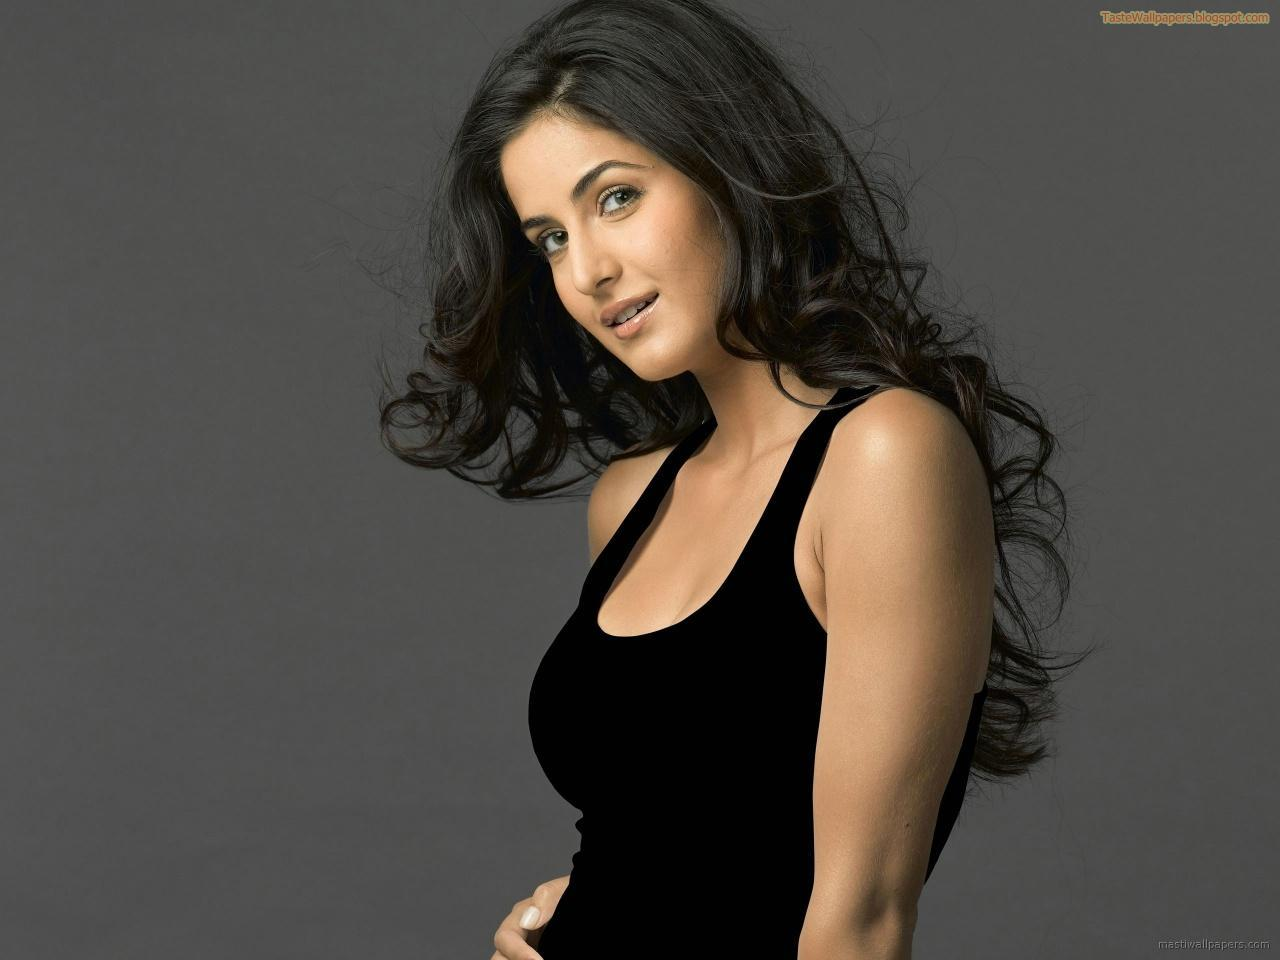 Bollywood katrina kaif hot hd wallpapers 2012 for Lovely hot pics